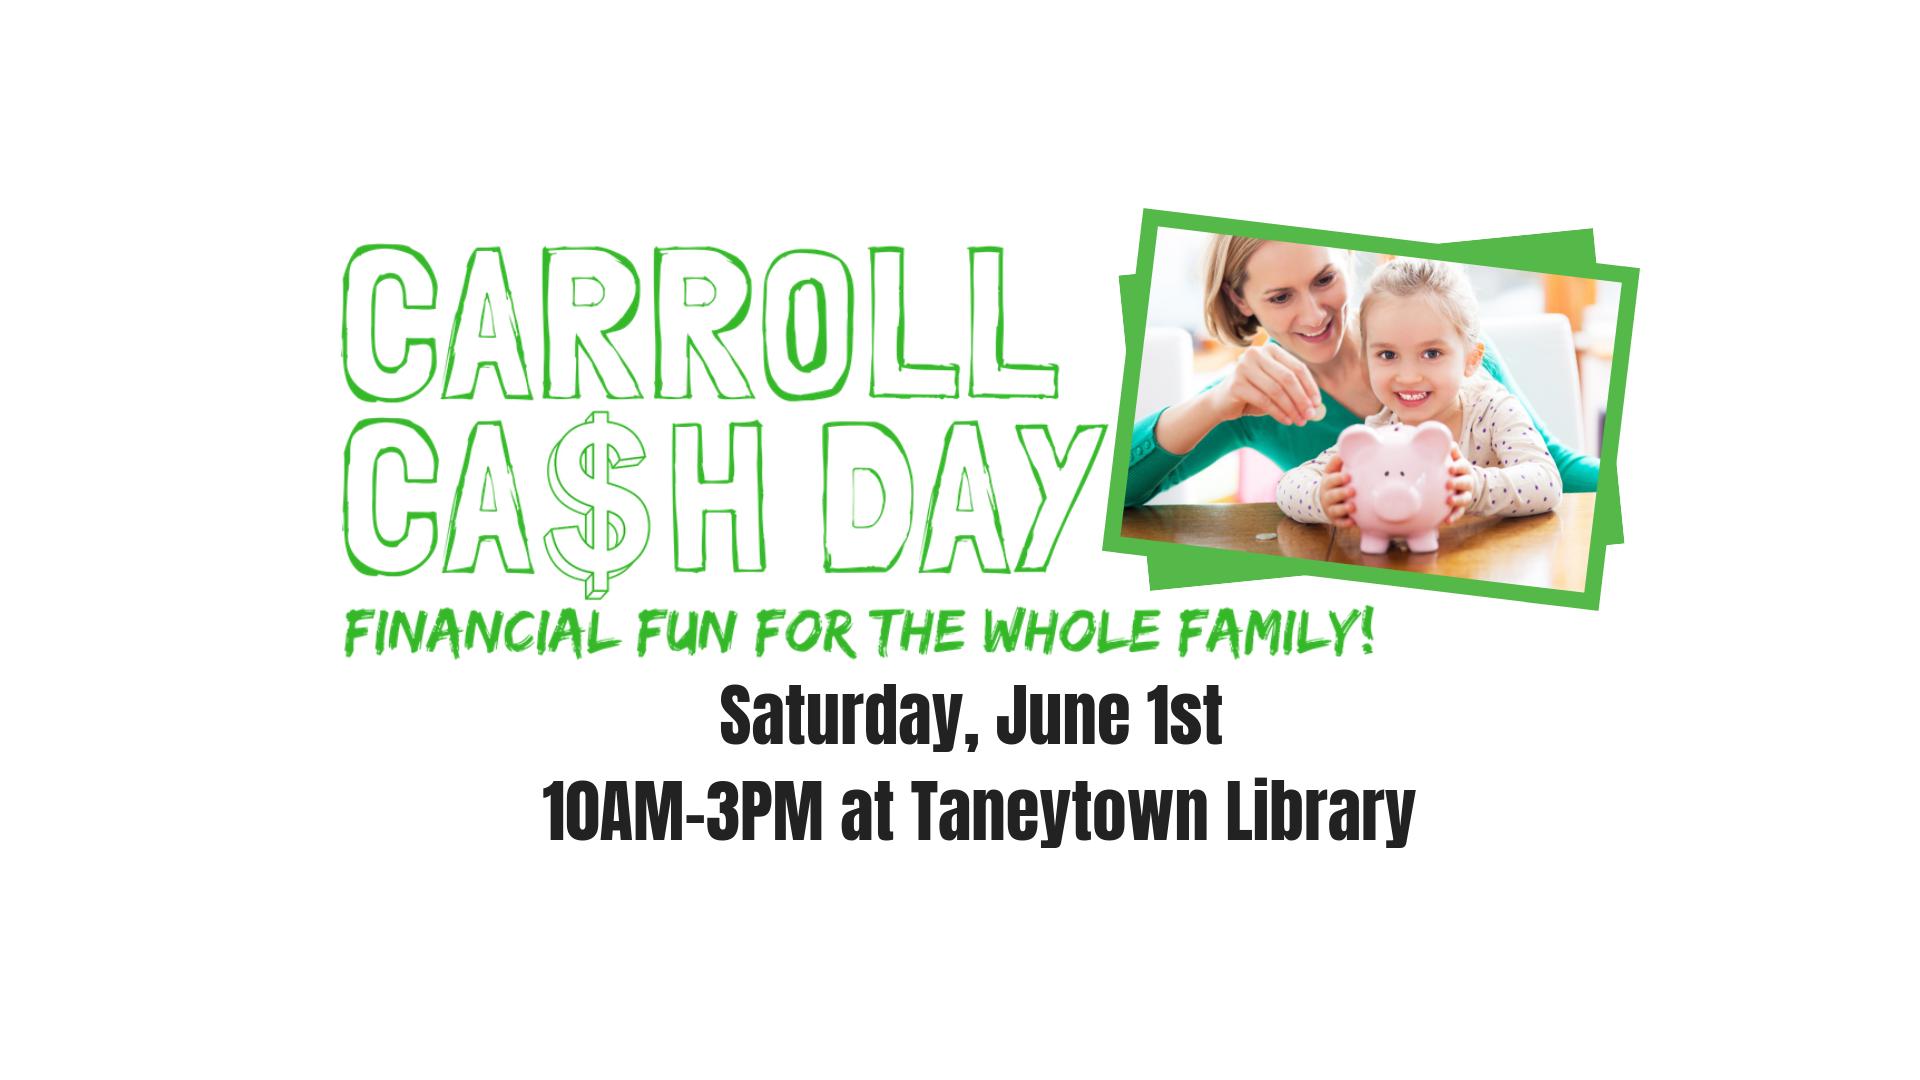 Carroll CA$H Day